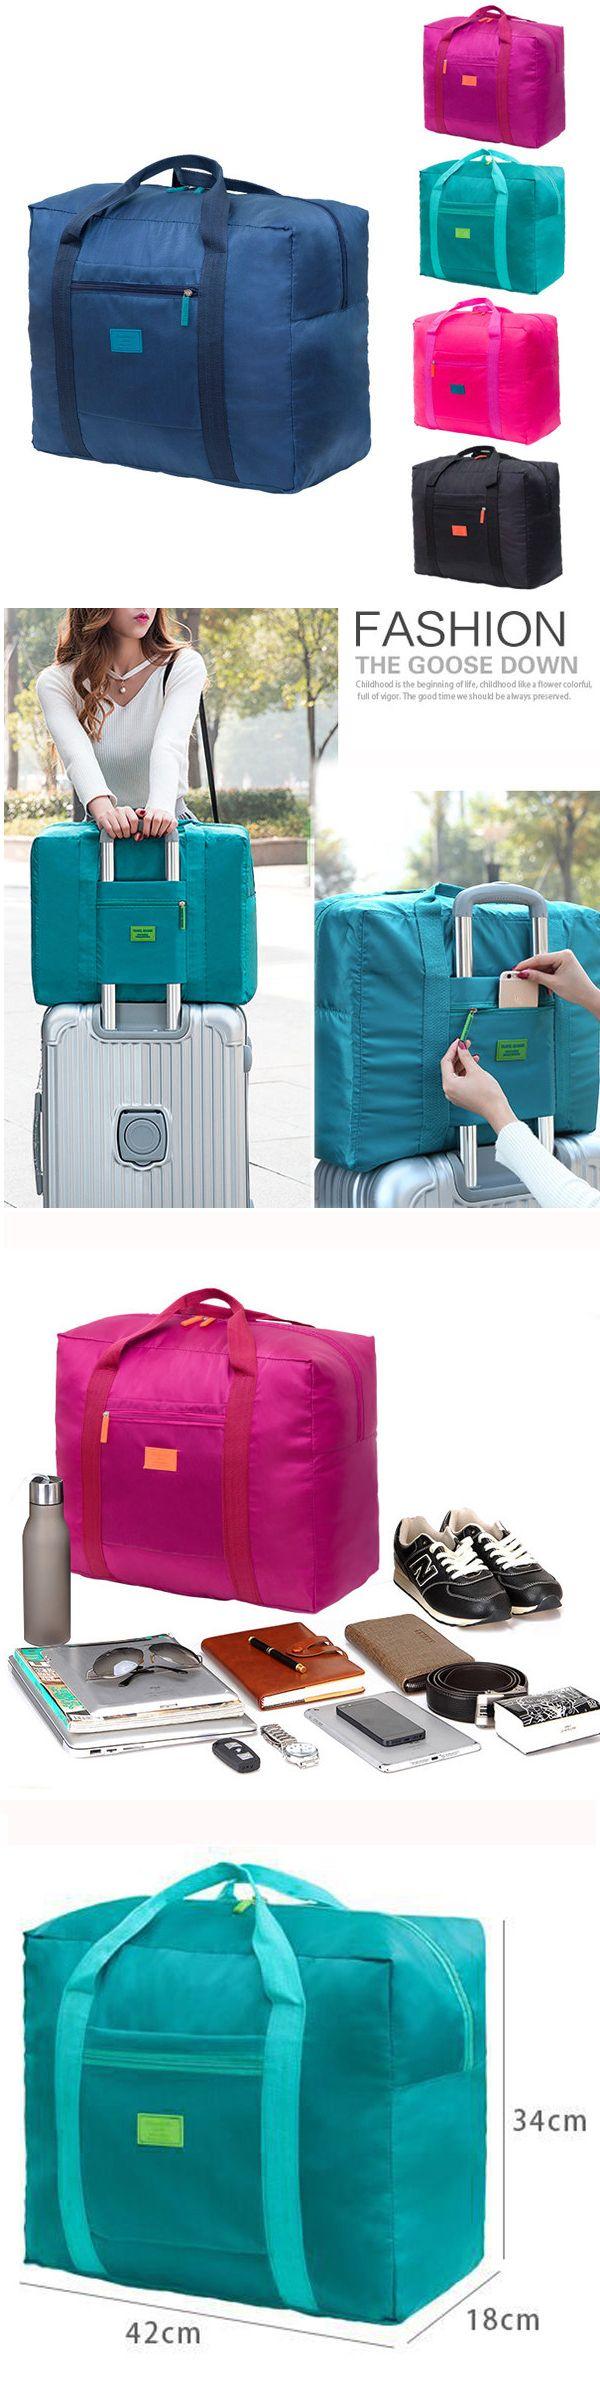 US$6.89  Women Nylon Travel Bag Outdoor Must-have Organizer Storage Bag High-end Luggage Bag